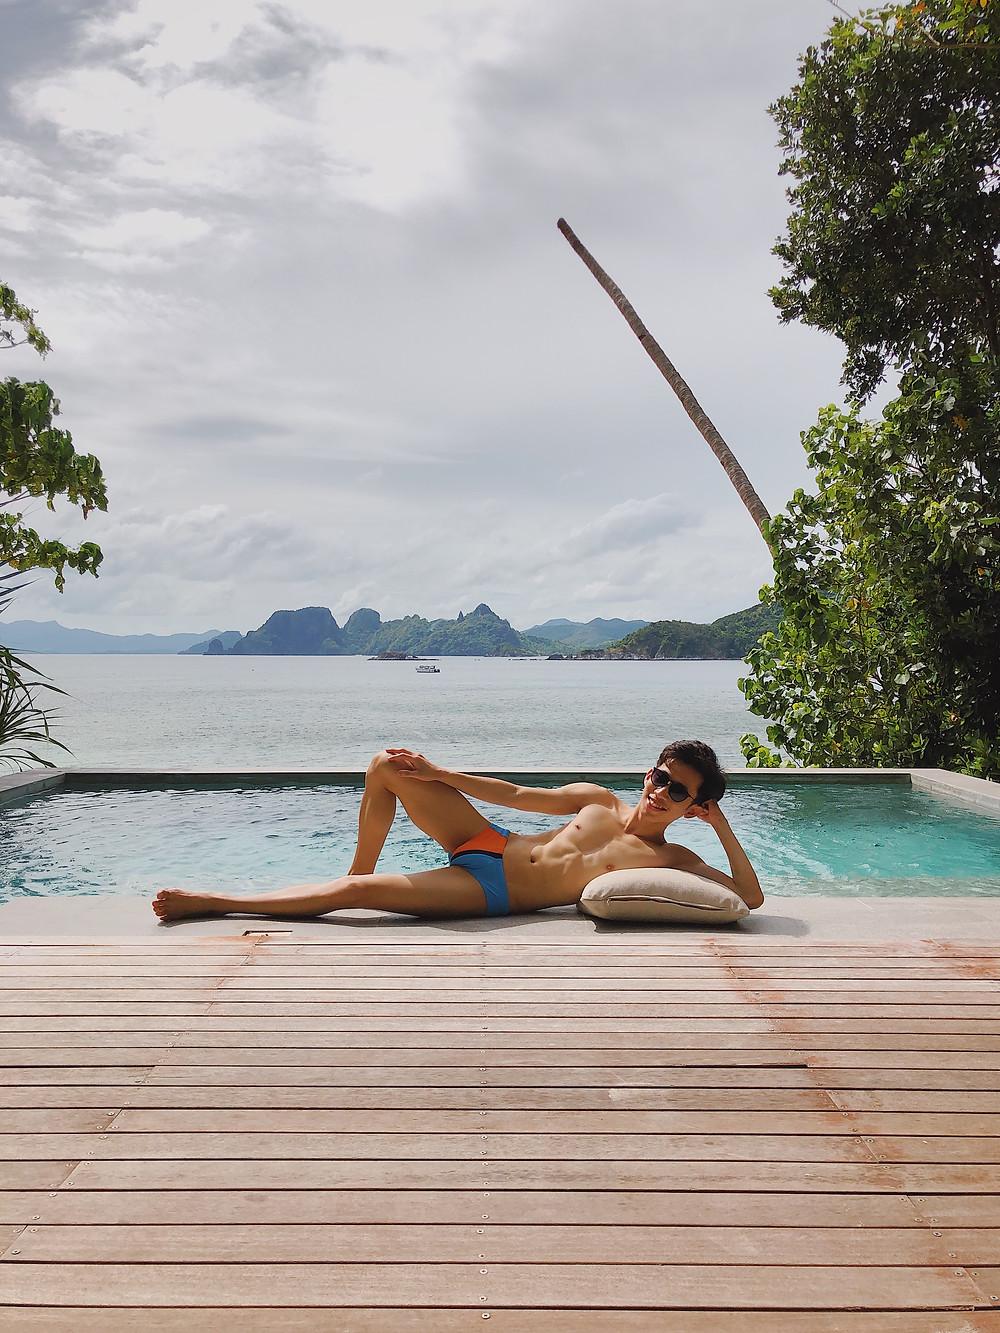 Pool Villa El Nido Resorts Pangulasian Island